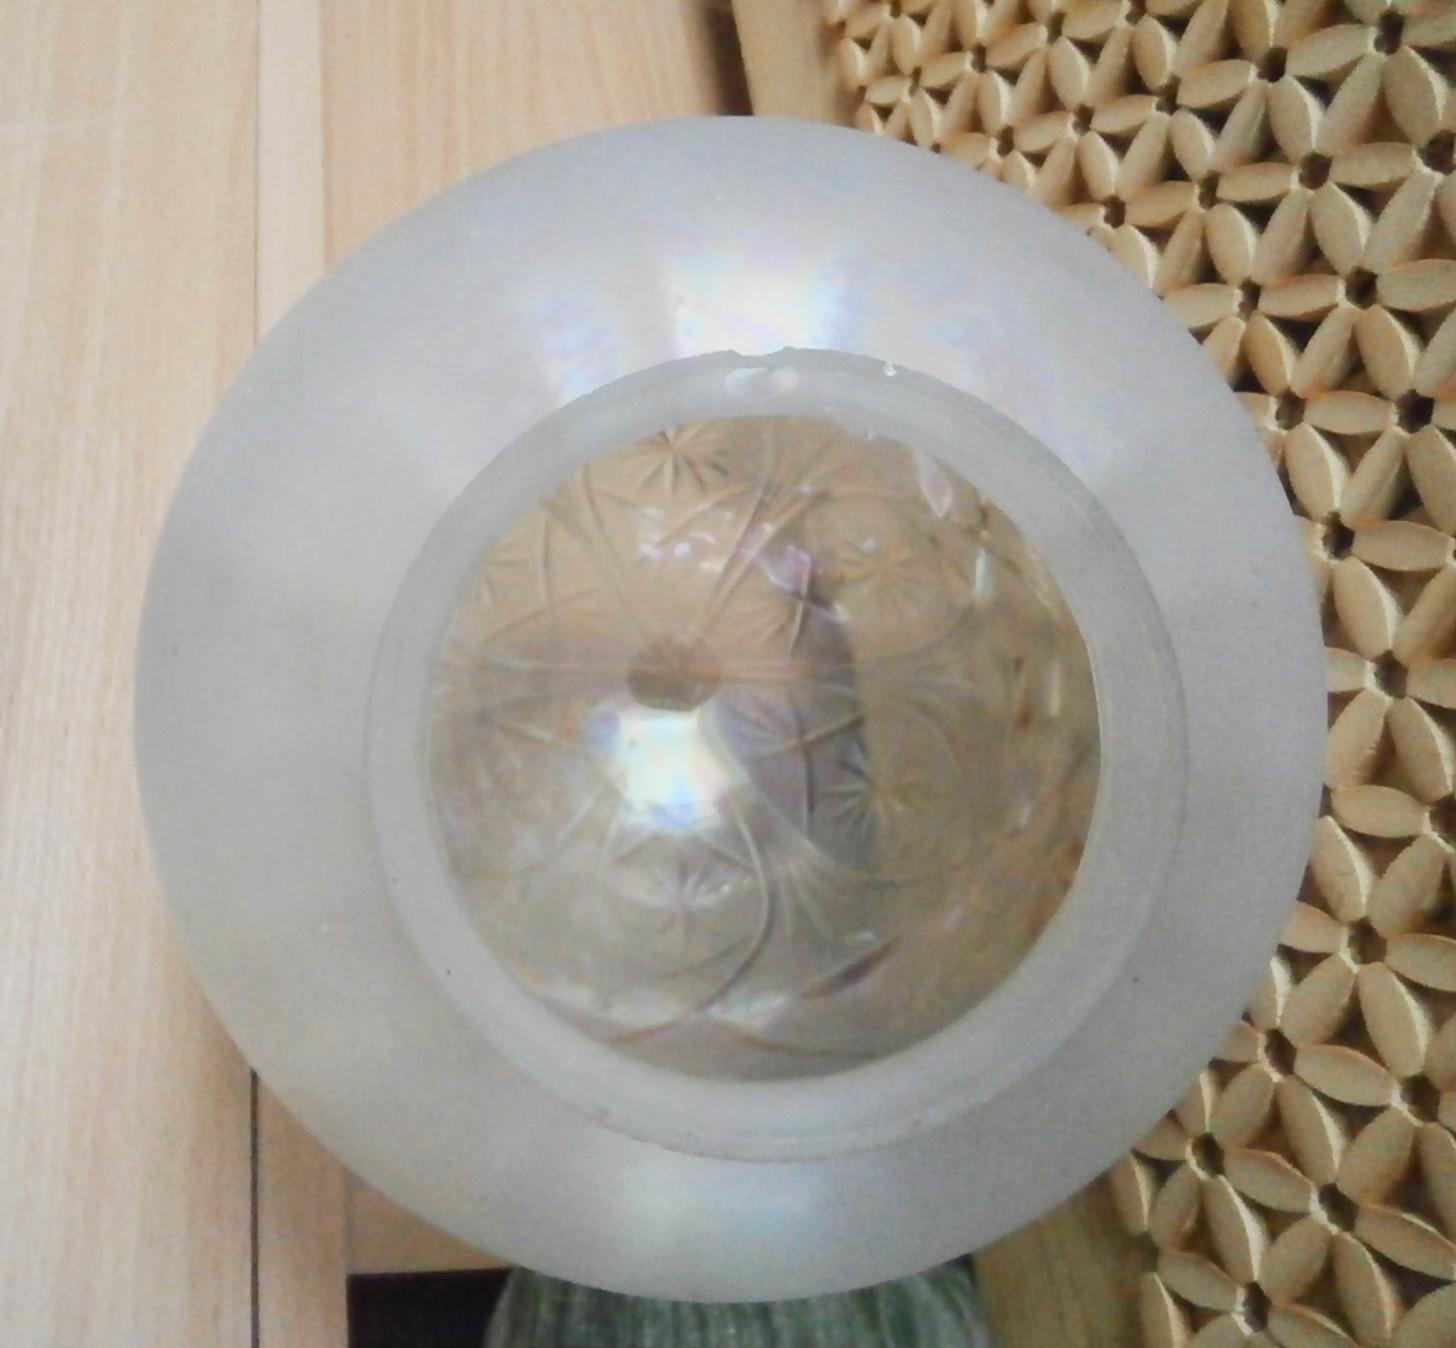 Stínidlo na lampu - Obrázek č. 3